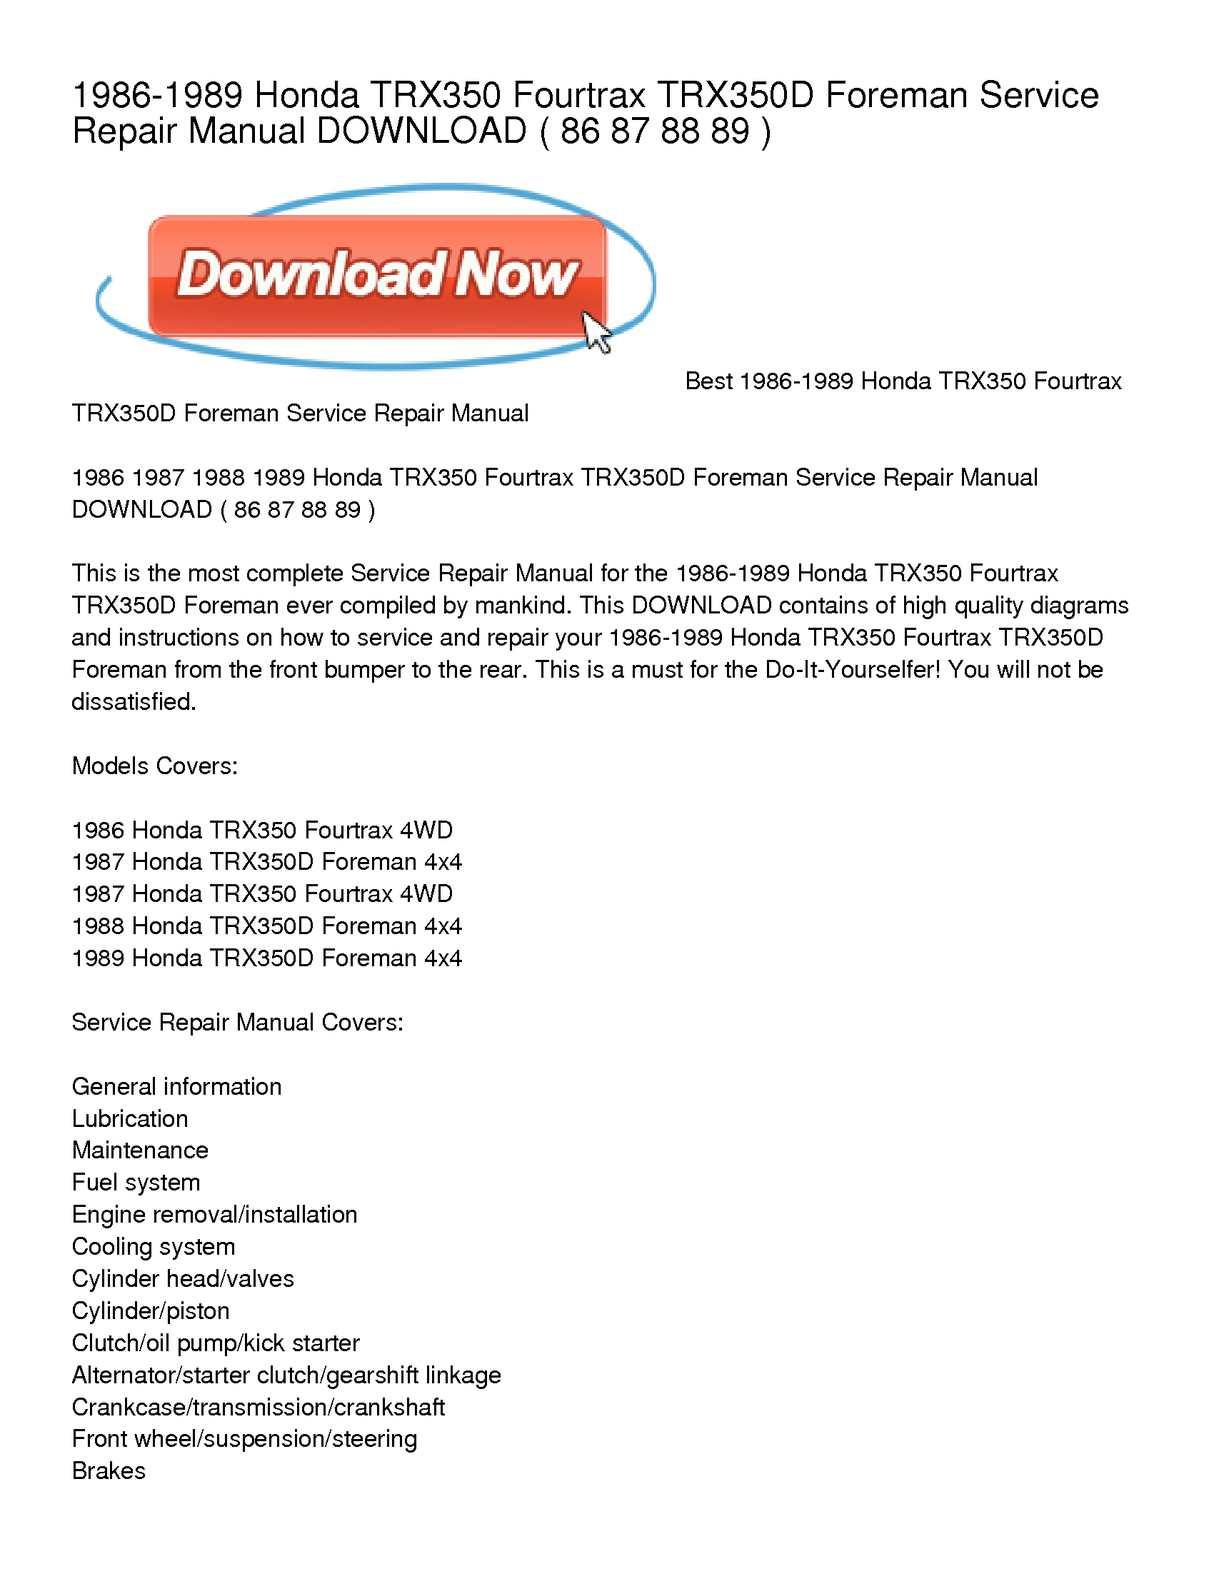 1986-1989 honda trx350 fourtrax trx350d foreman service repair manual  download